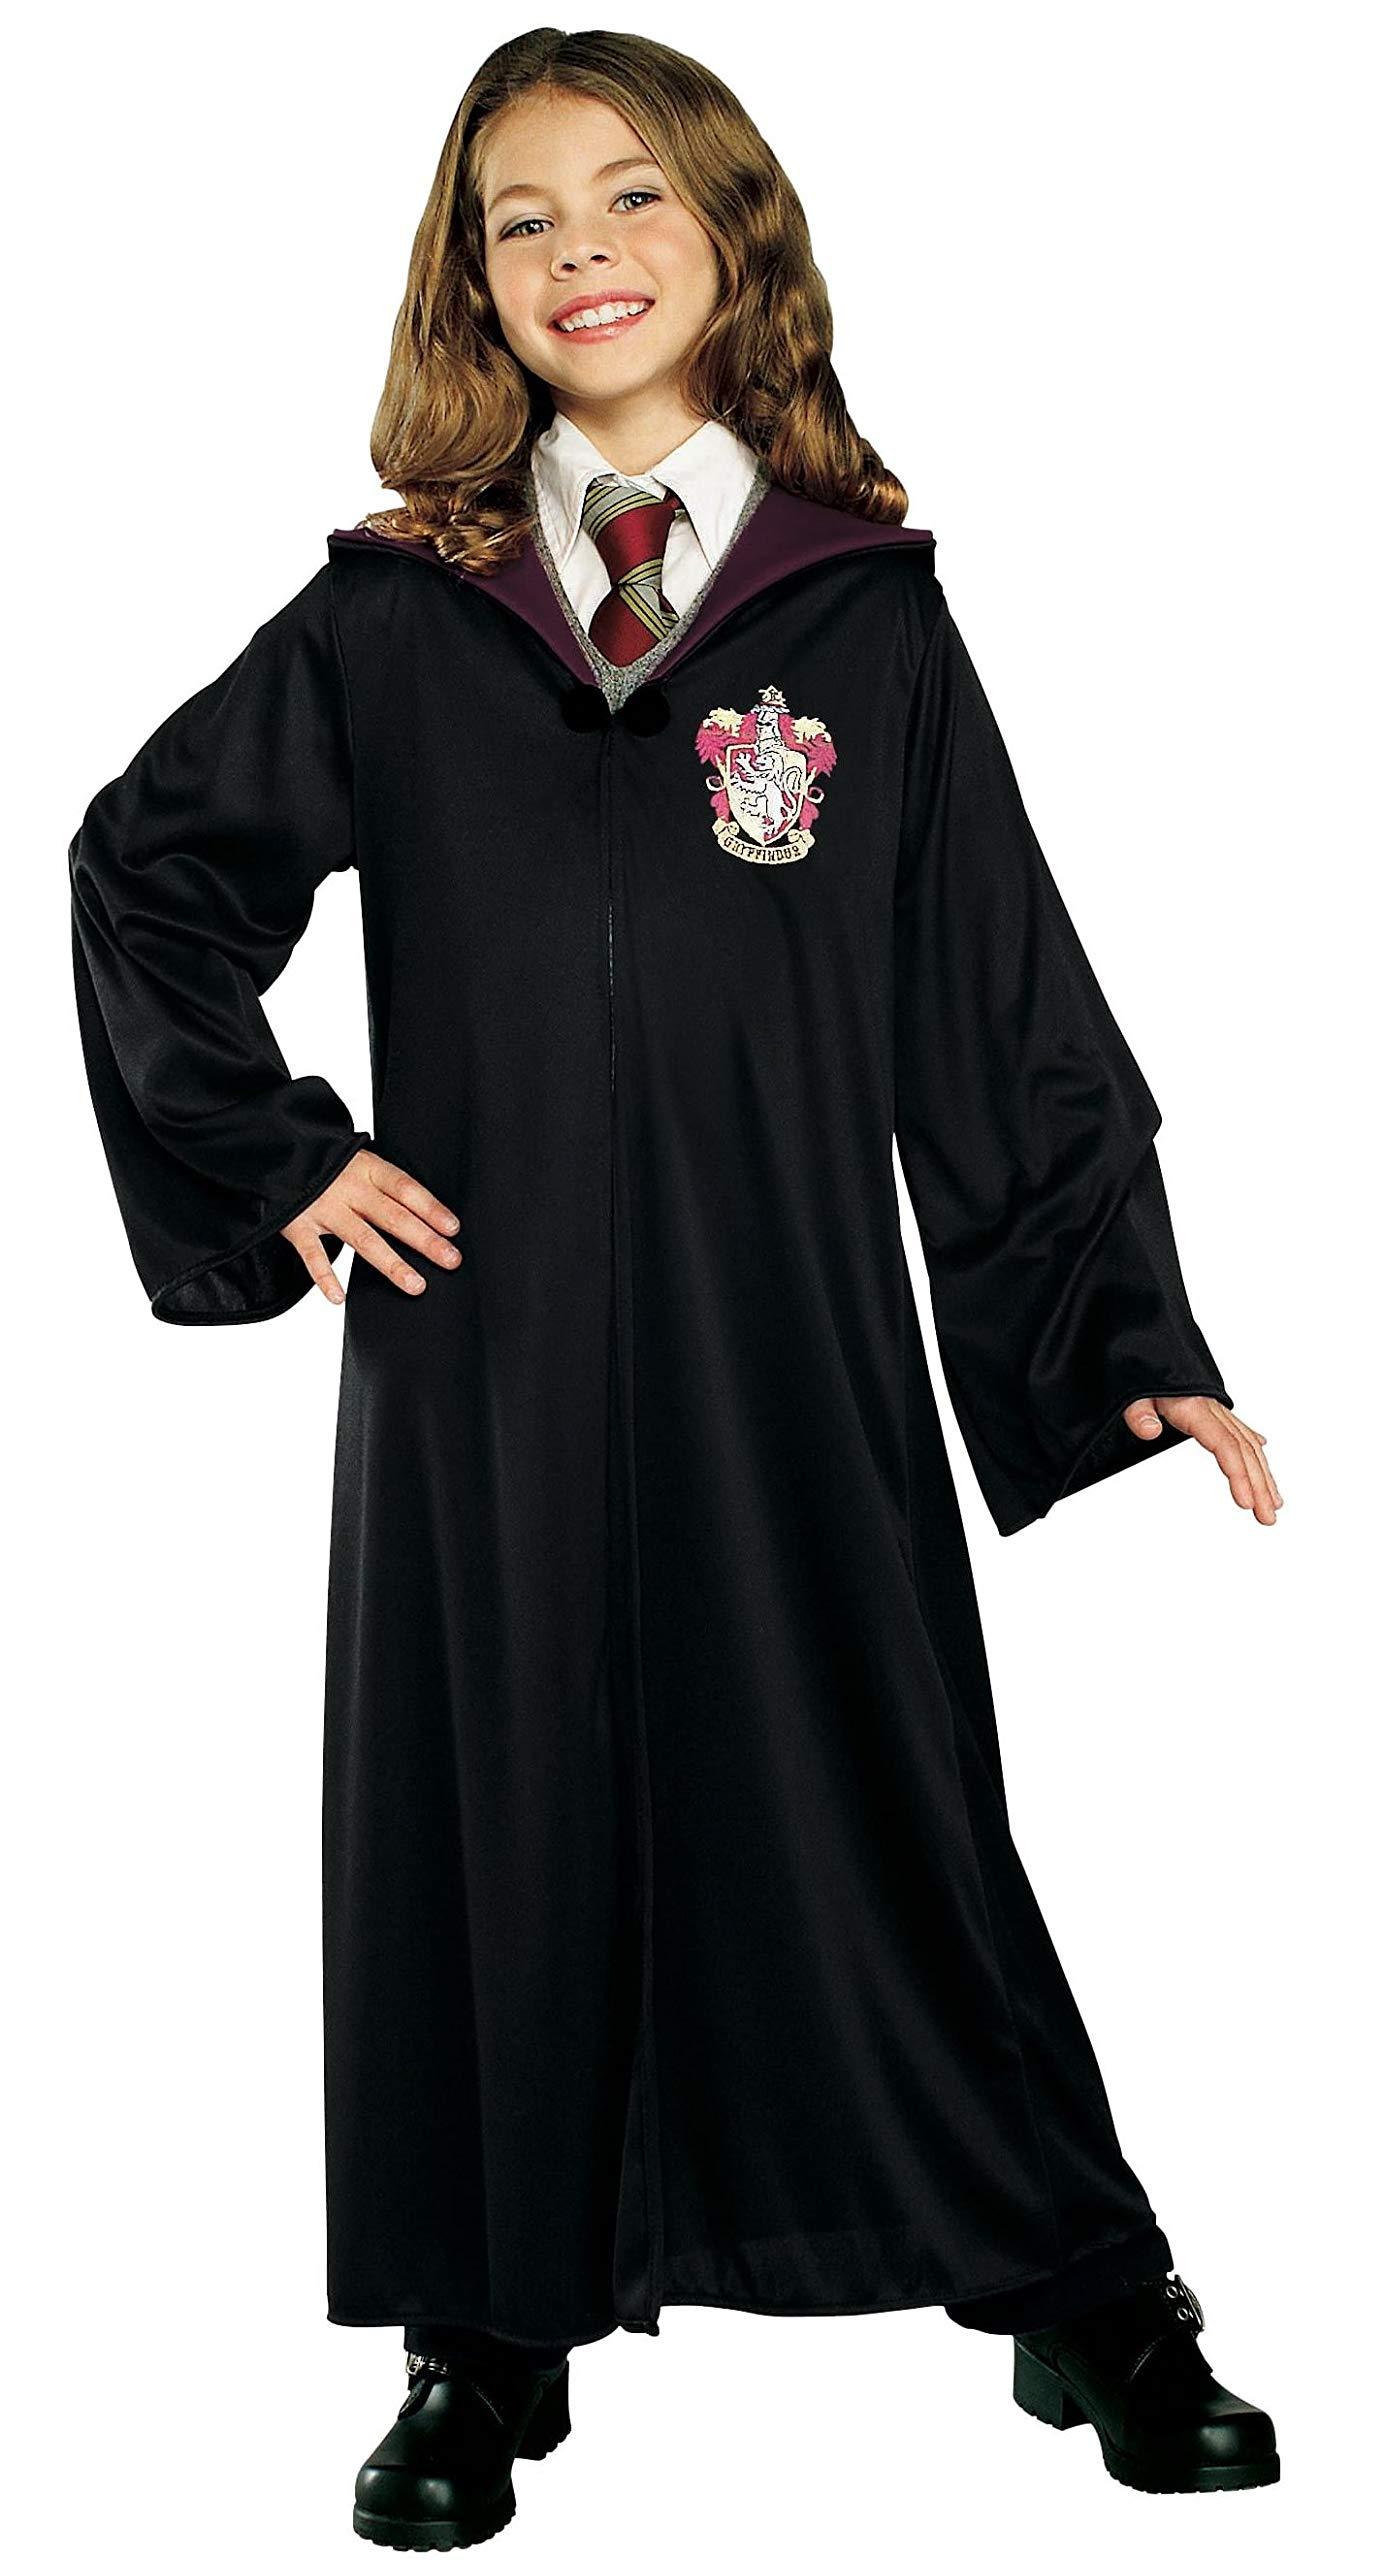 ba0d42457fab Rubies 884253 Harry Potter - Gryffindor toga per bambini, Taglia L ...